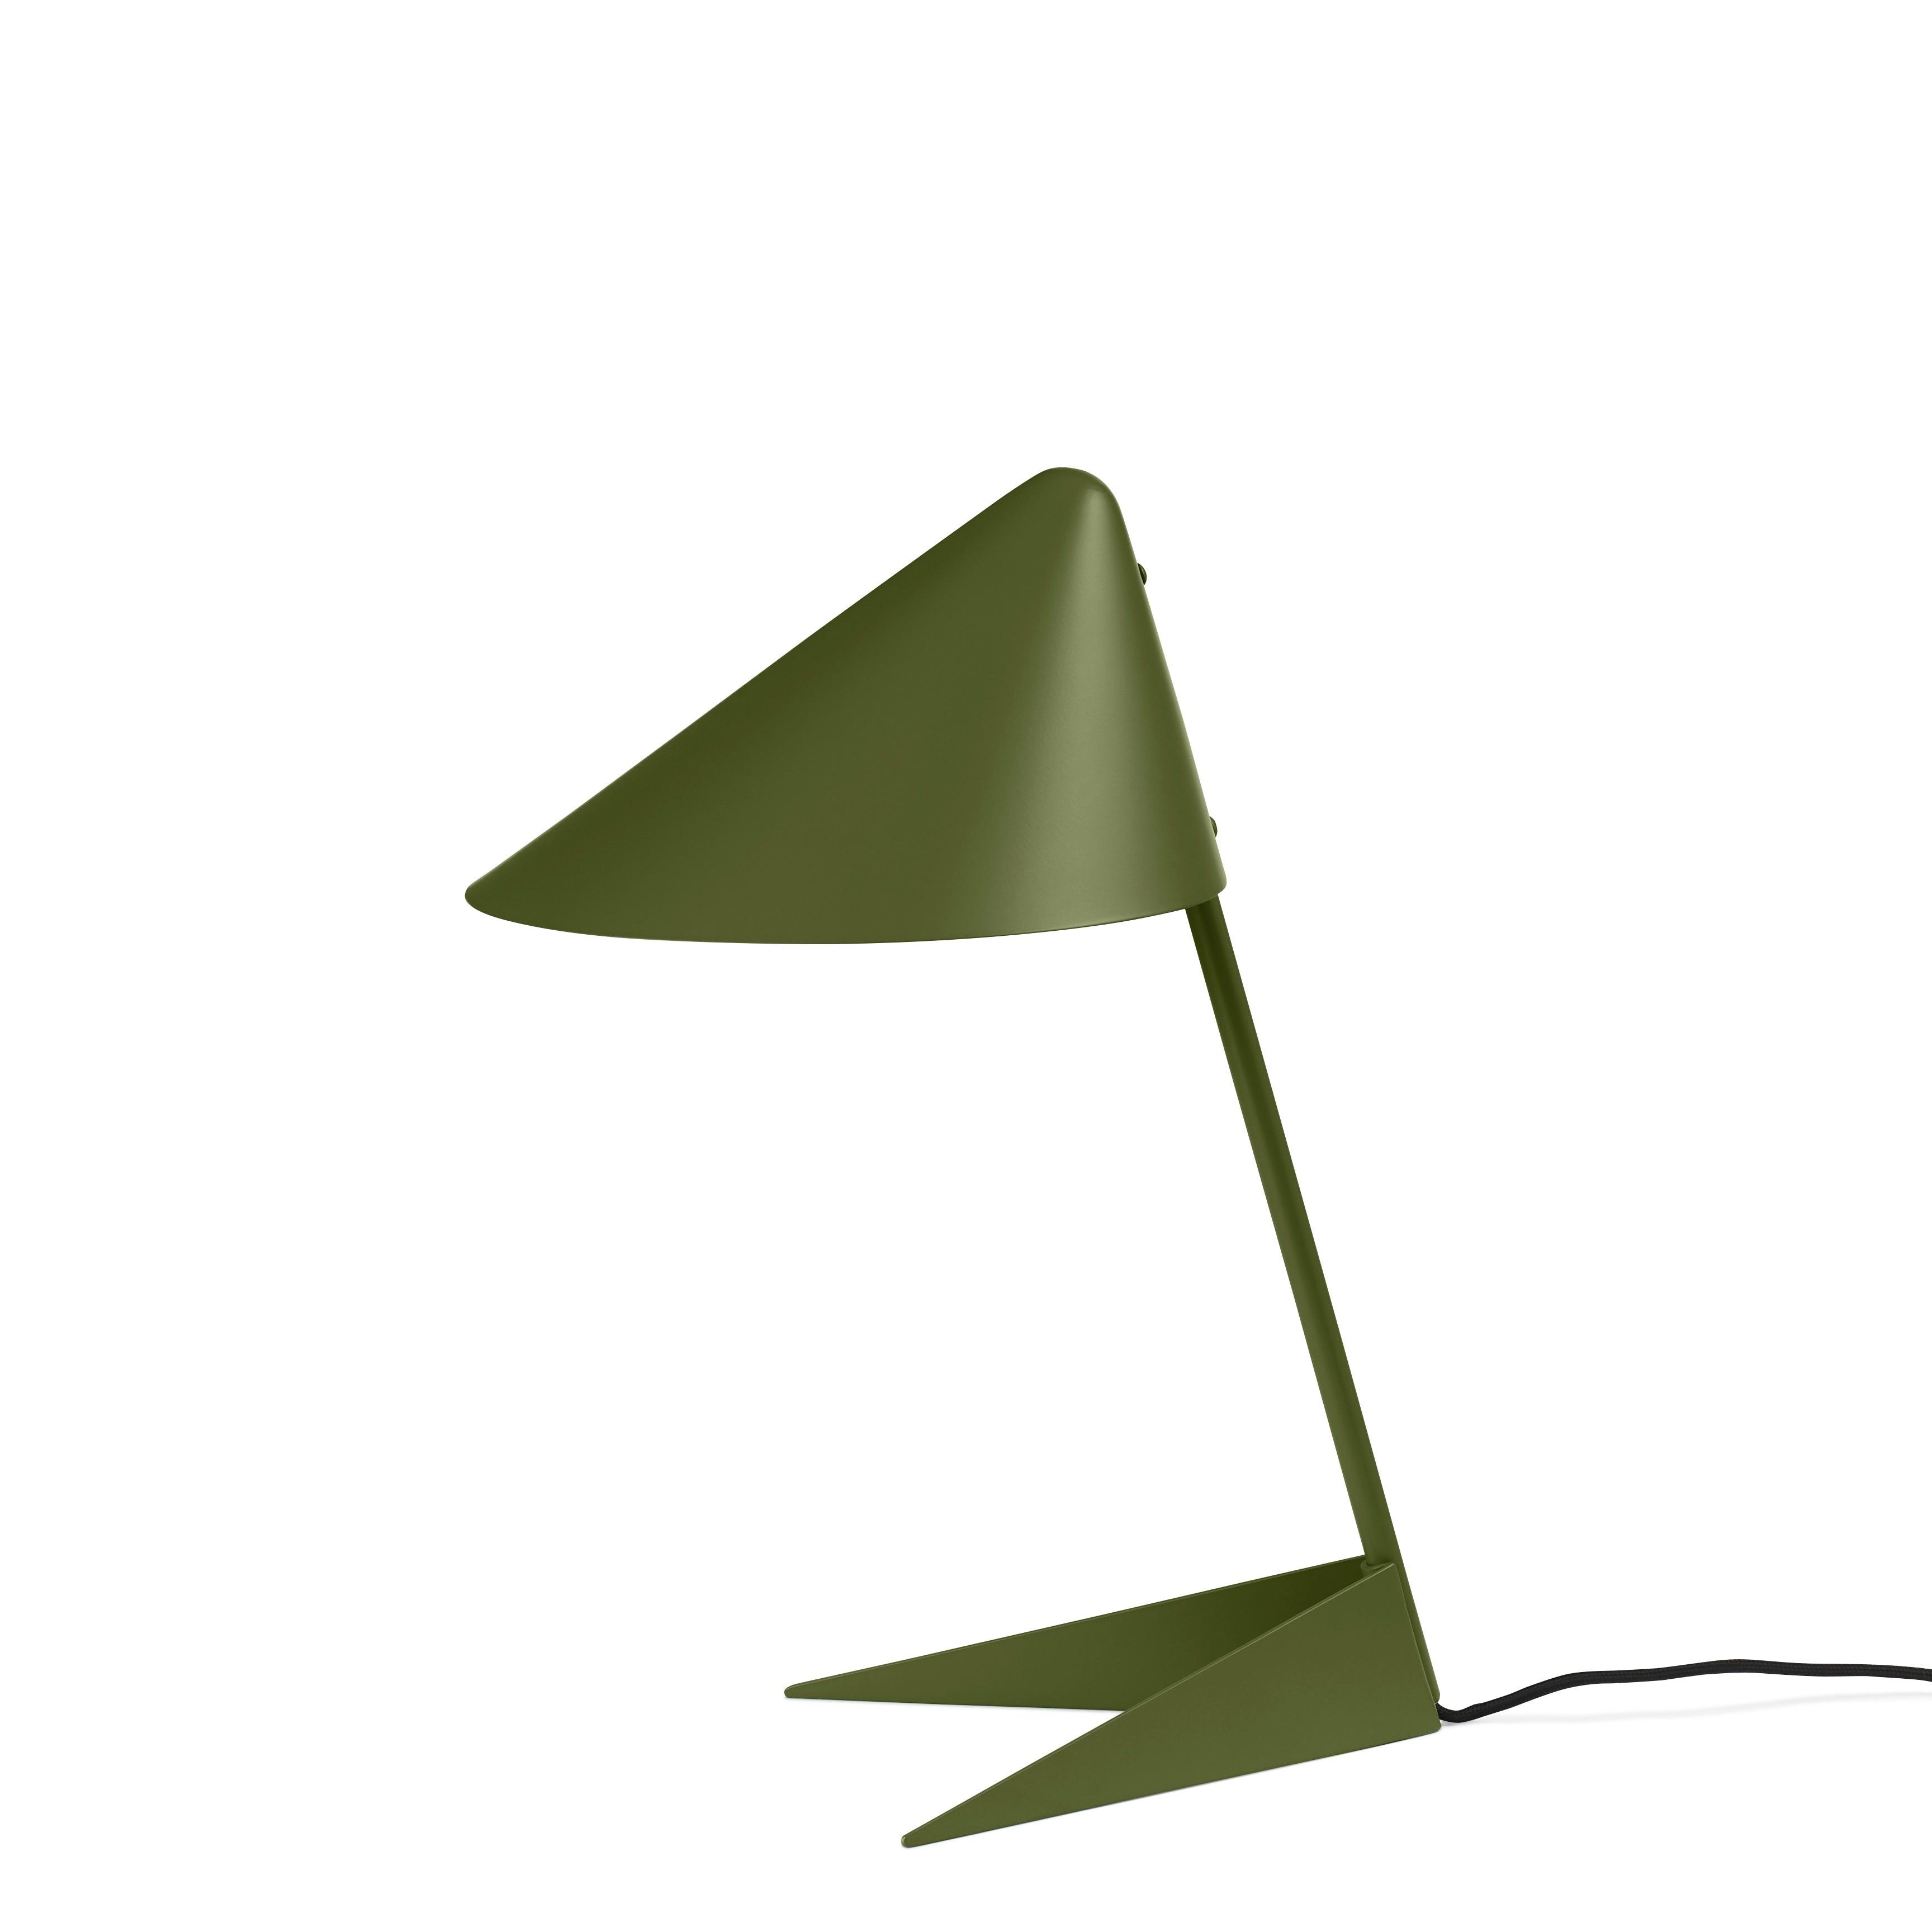 Ambience bordslampa pine green